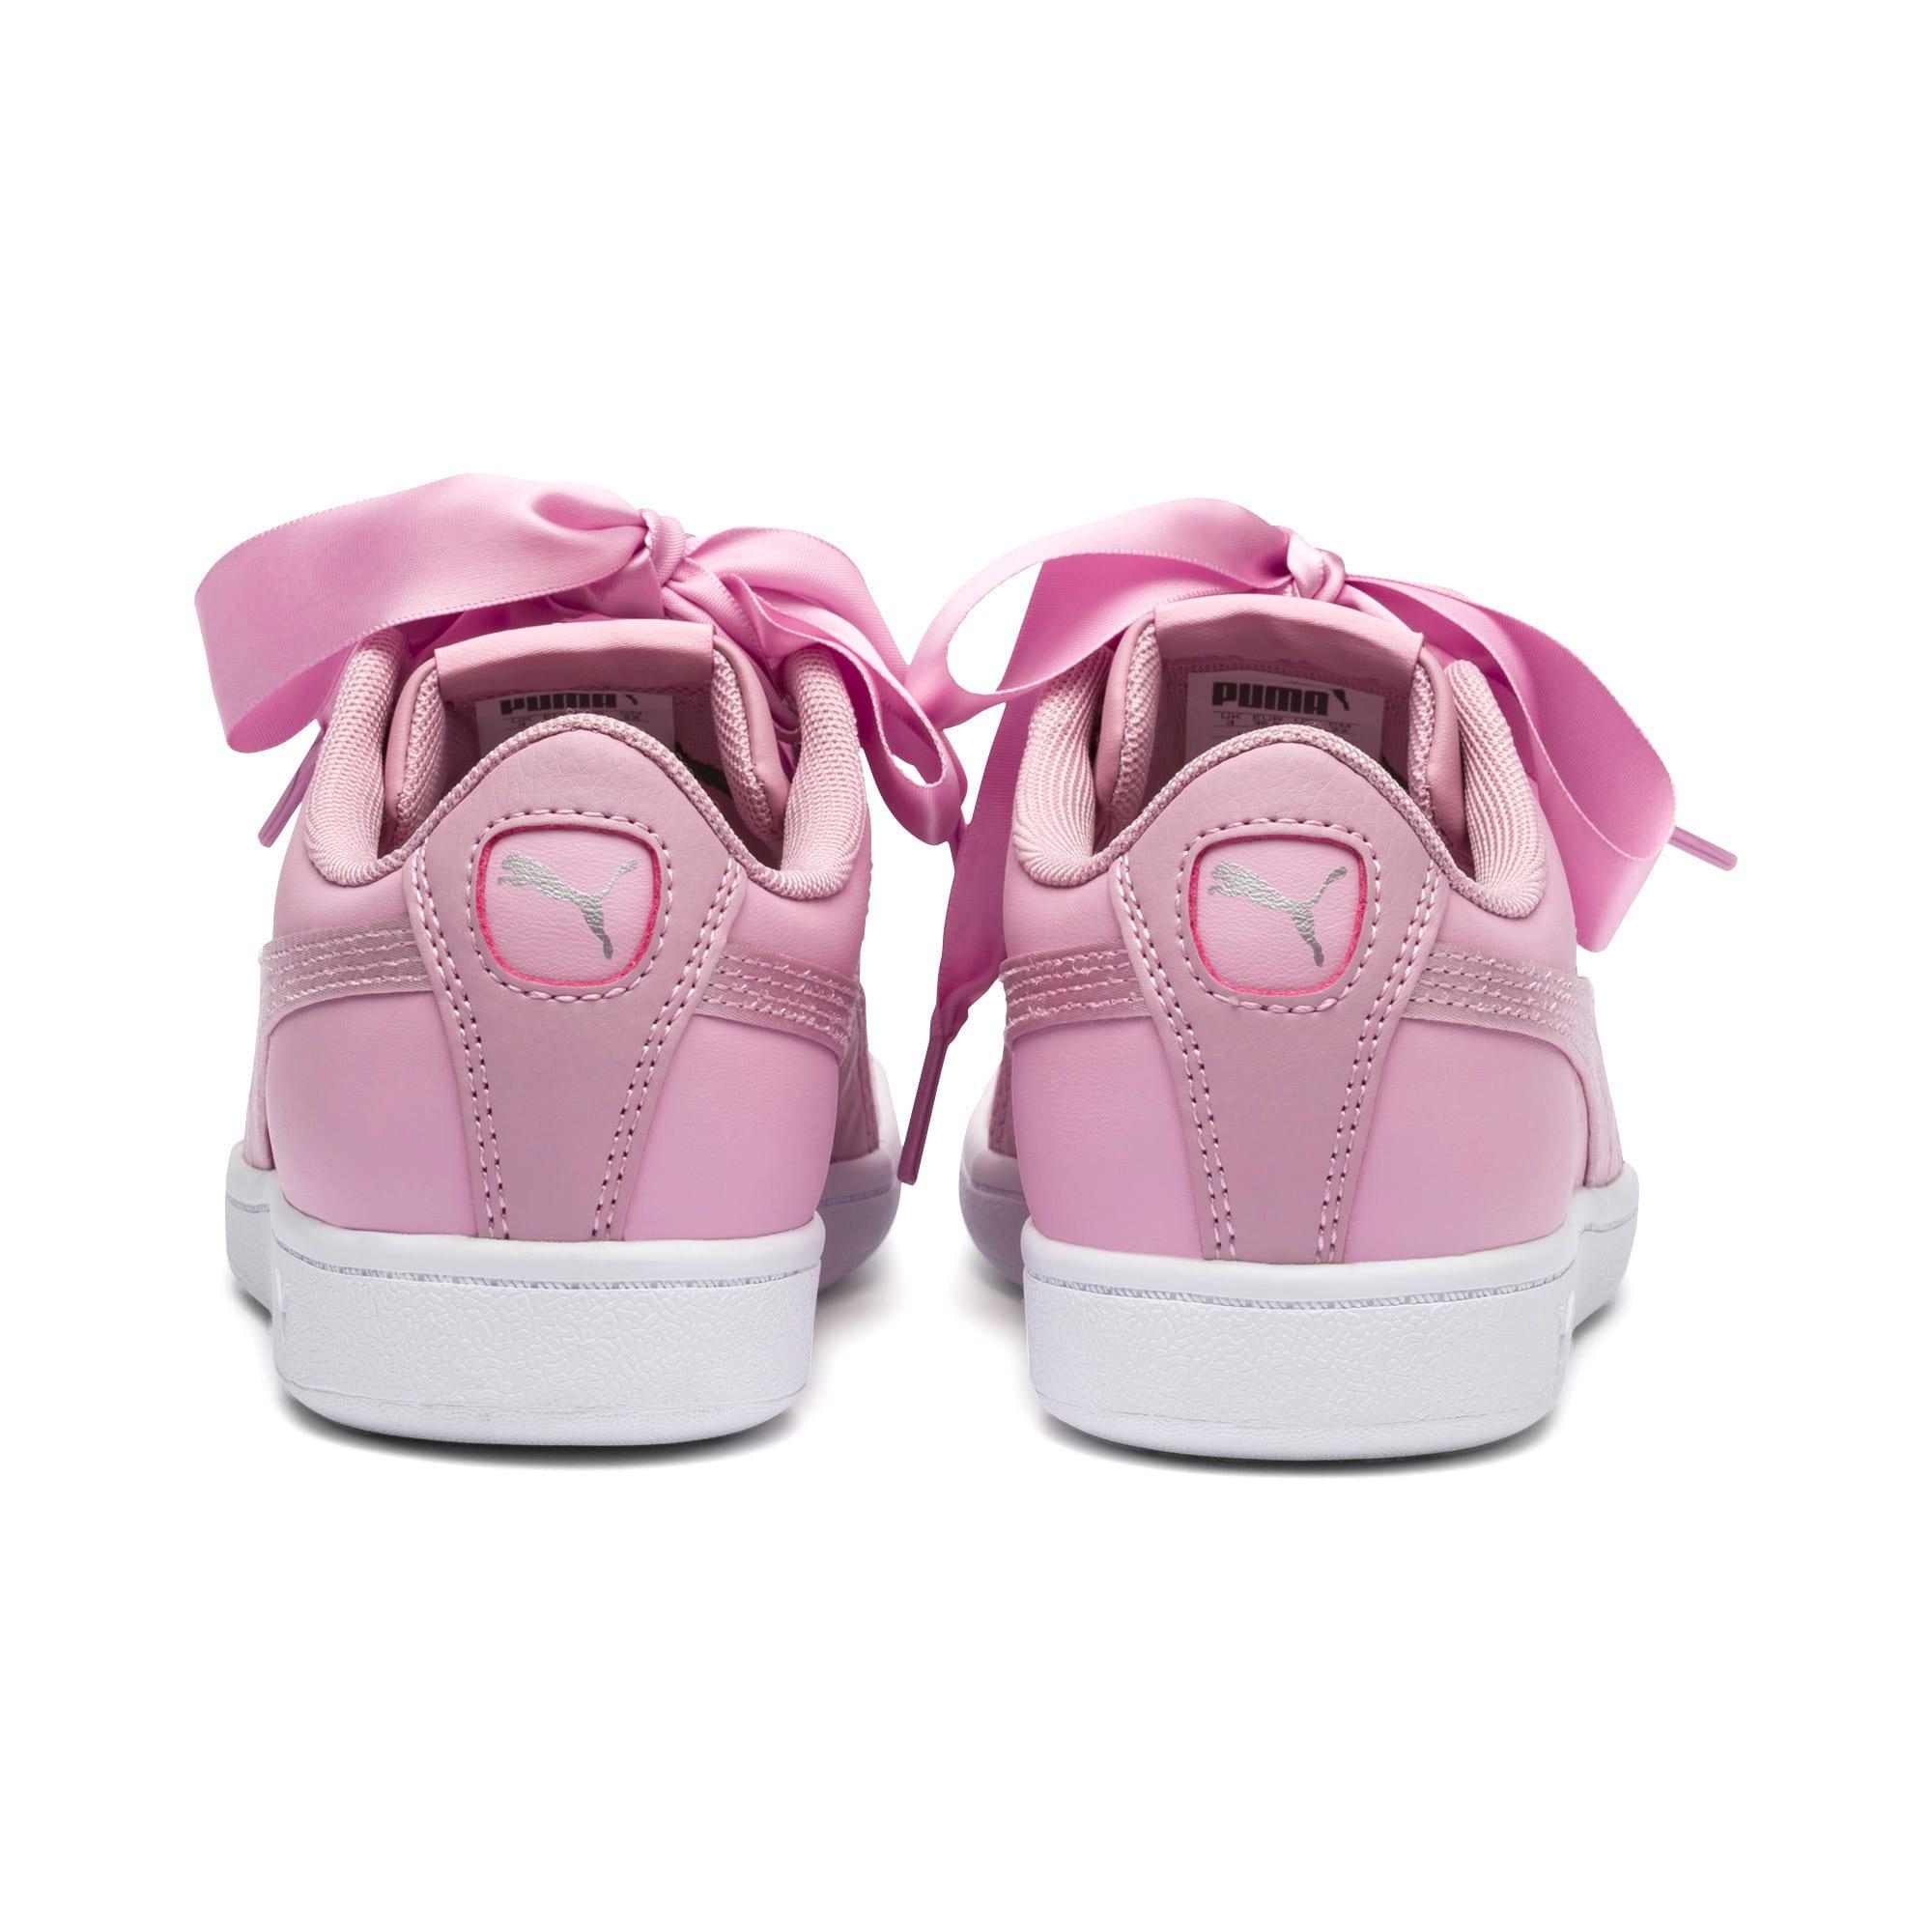 Thumbnail 3 of PUMA Vikky Ribbon Satin Sneakers JR, Pale Pink-Pale Pink, medium